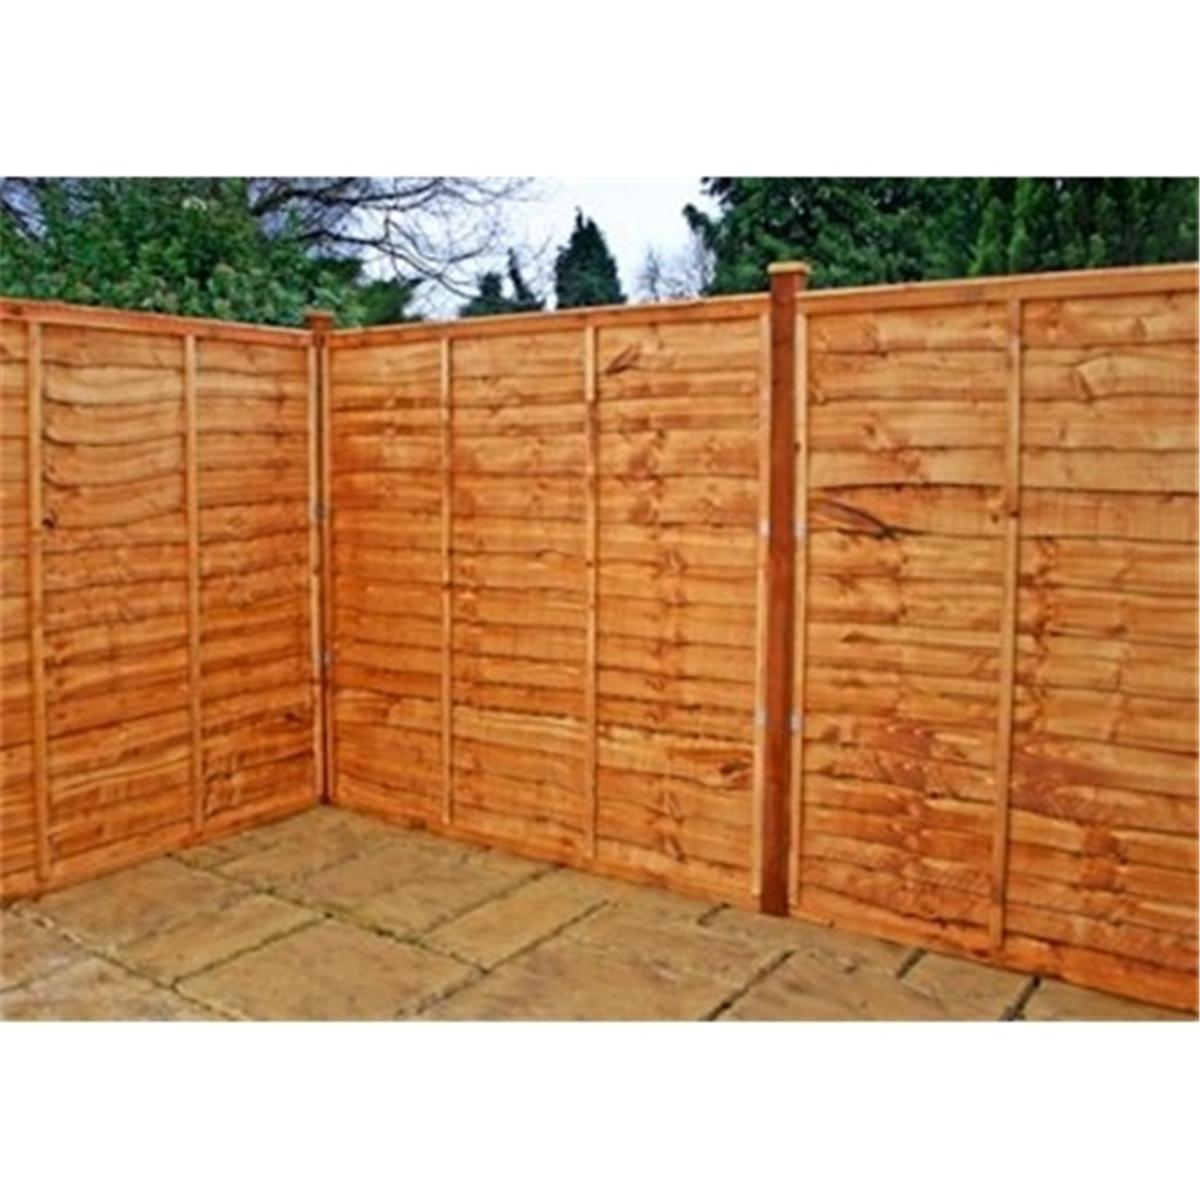 8 foot lap panel fences fences 6 ft x 8 ft solid tongue and groove vinyl fence panel white baanklon Choice Image